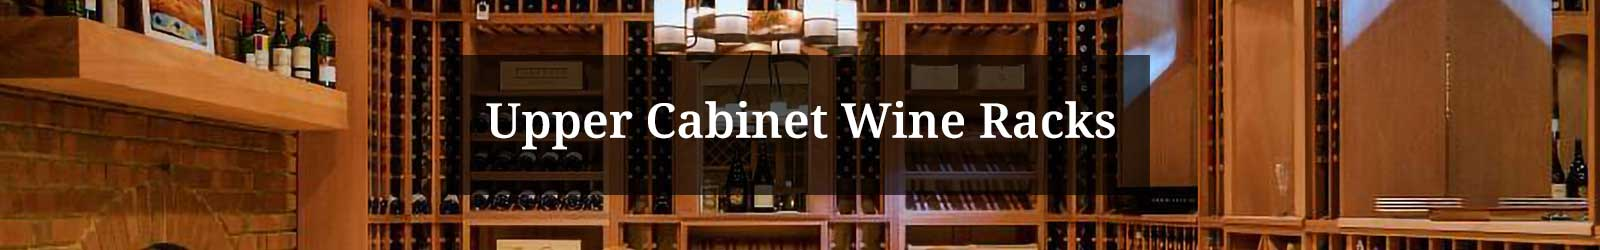 Upper Cabinet Wine Racks